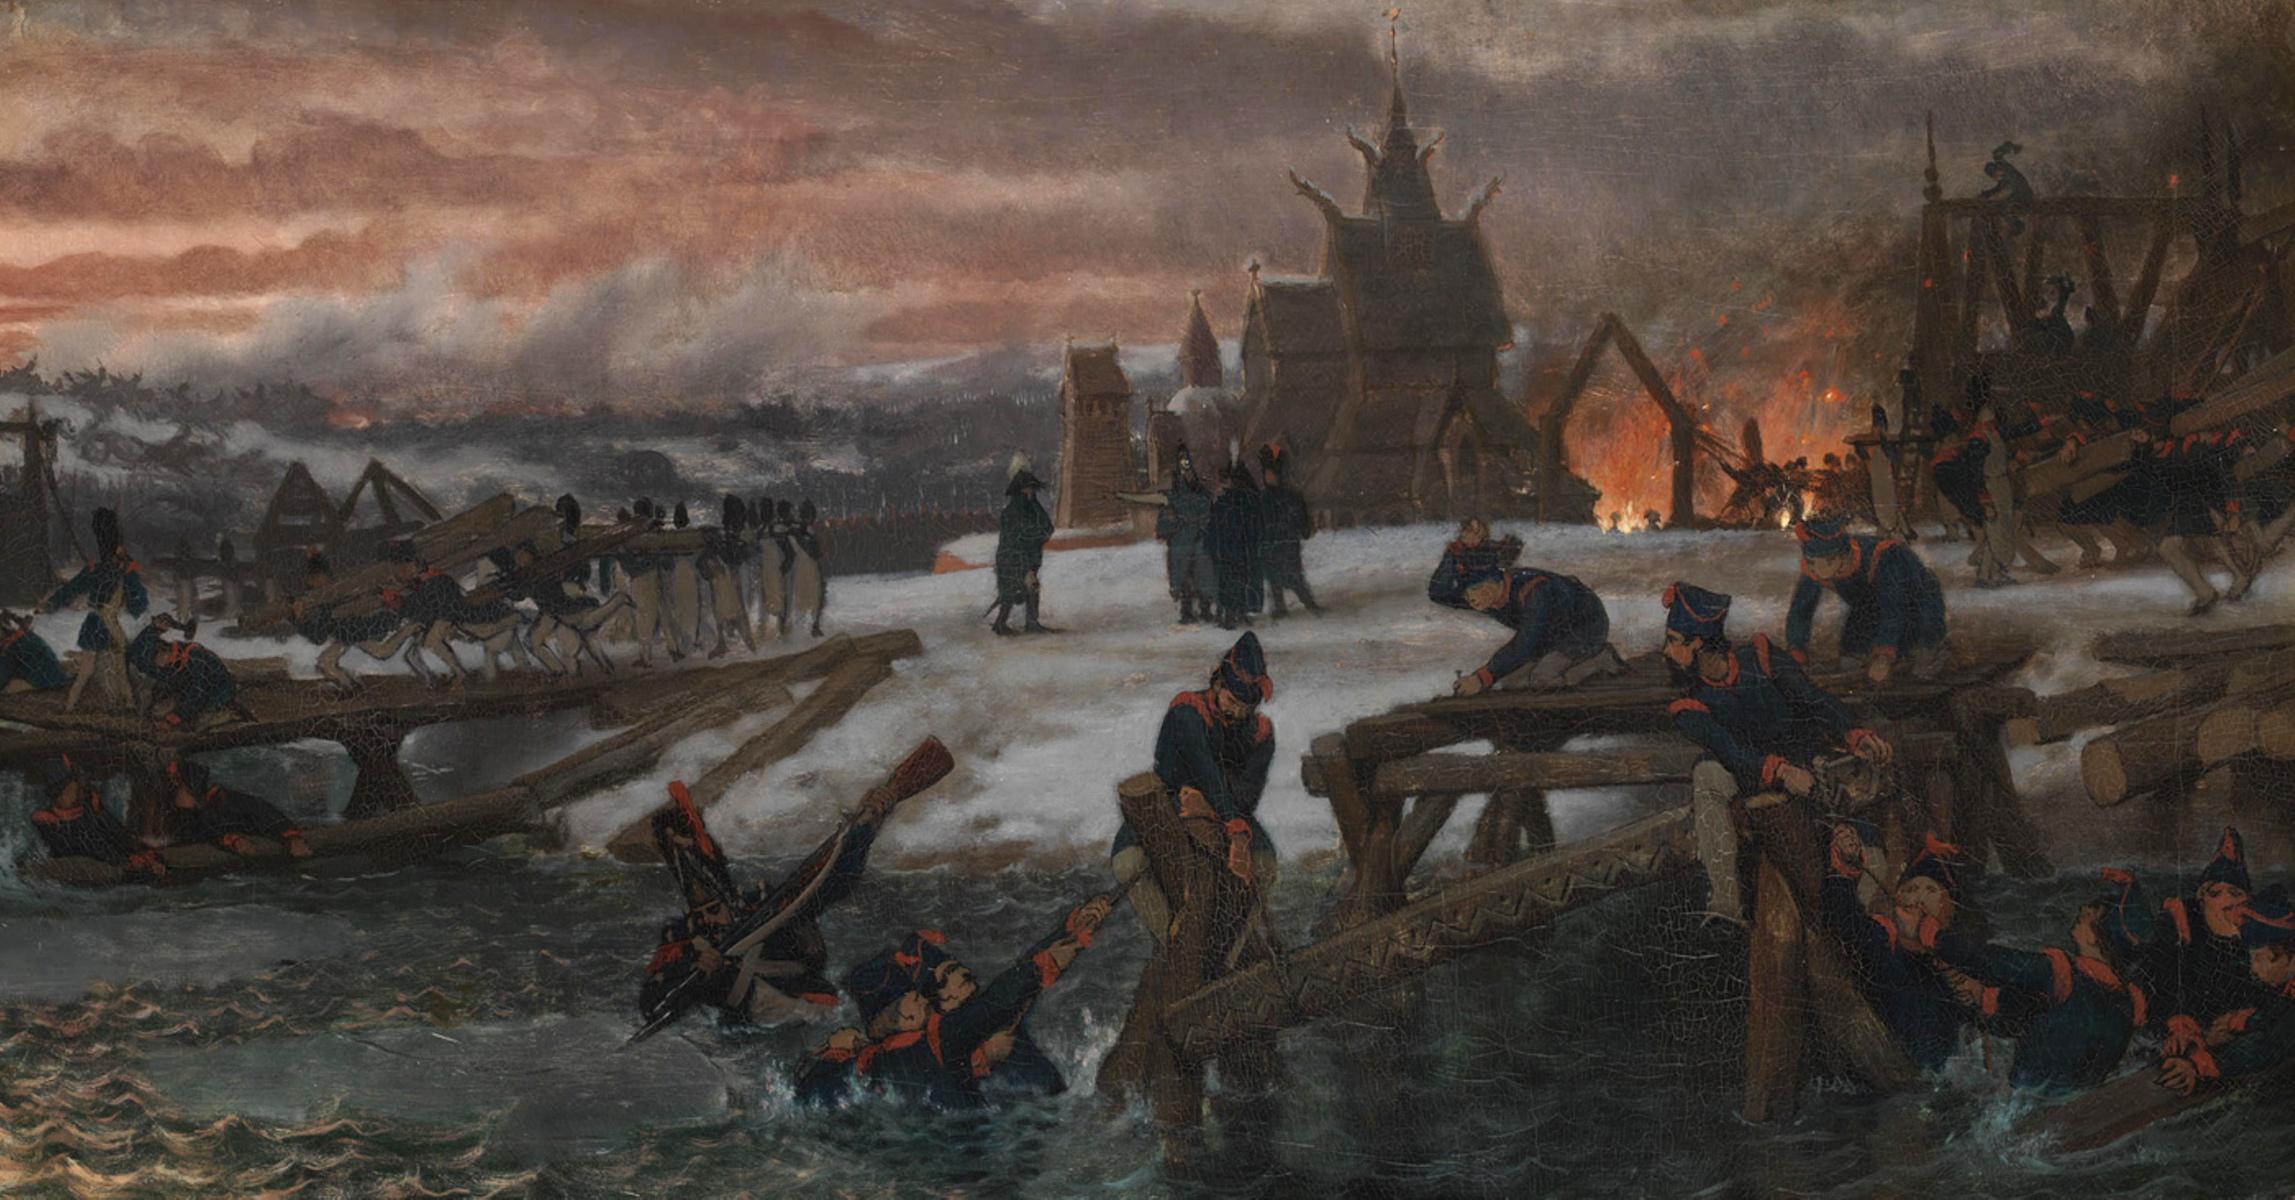 "zwischen 1859 und 1869, Öl auf Leinwand, 42 cm x 76 cm, Amsterdam Museum, Inv.-Nr. SA 4857. <br/>Quelle: <a href=""http://am.adlibhosting.com/amonline/advanced/Details/collect/38132"">Amsterdam Museum</a> <br/>Lizenz: Public Domain"